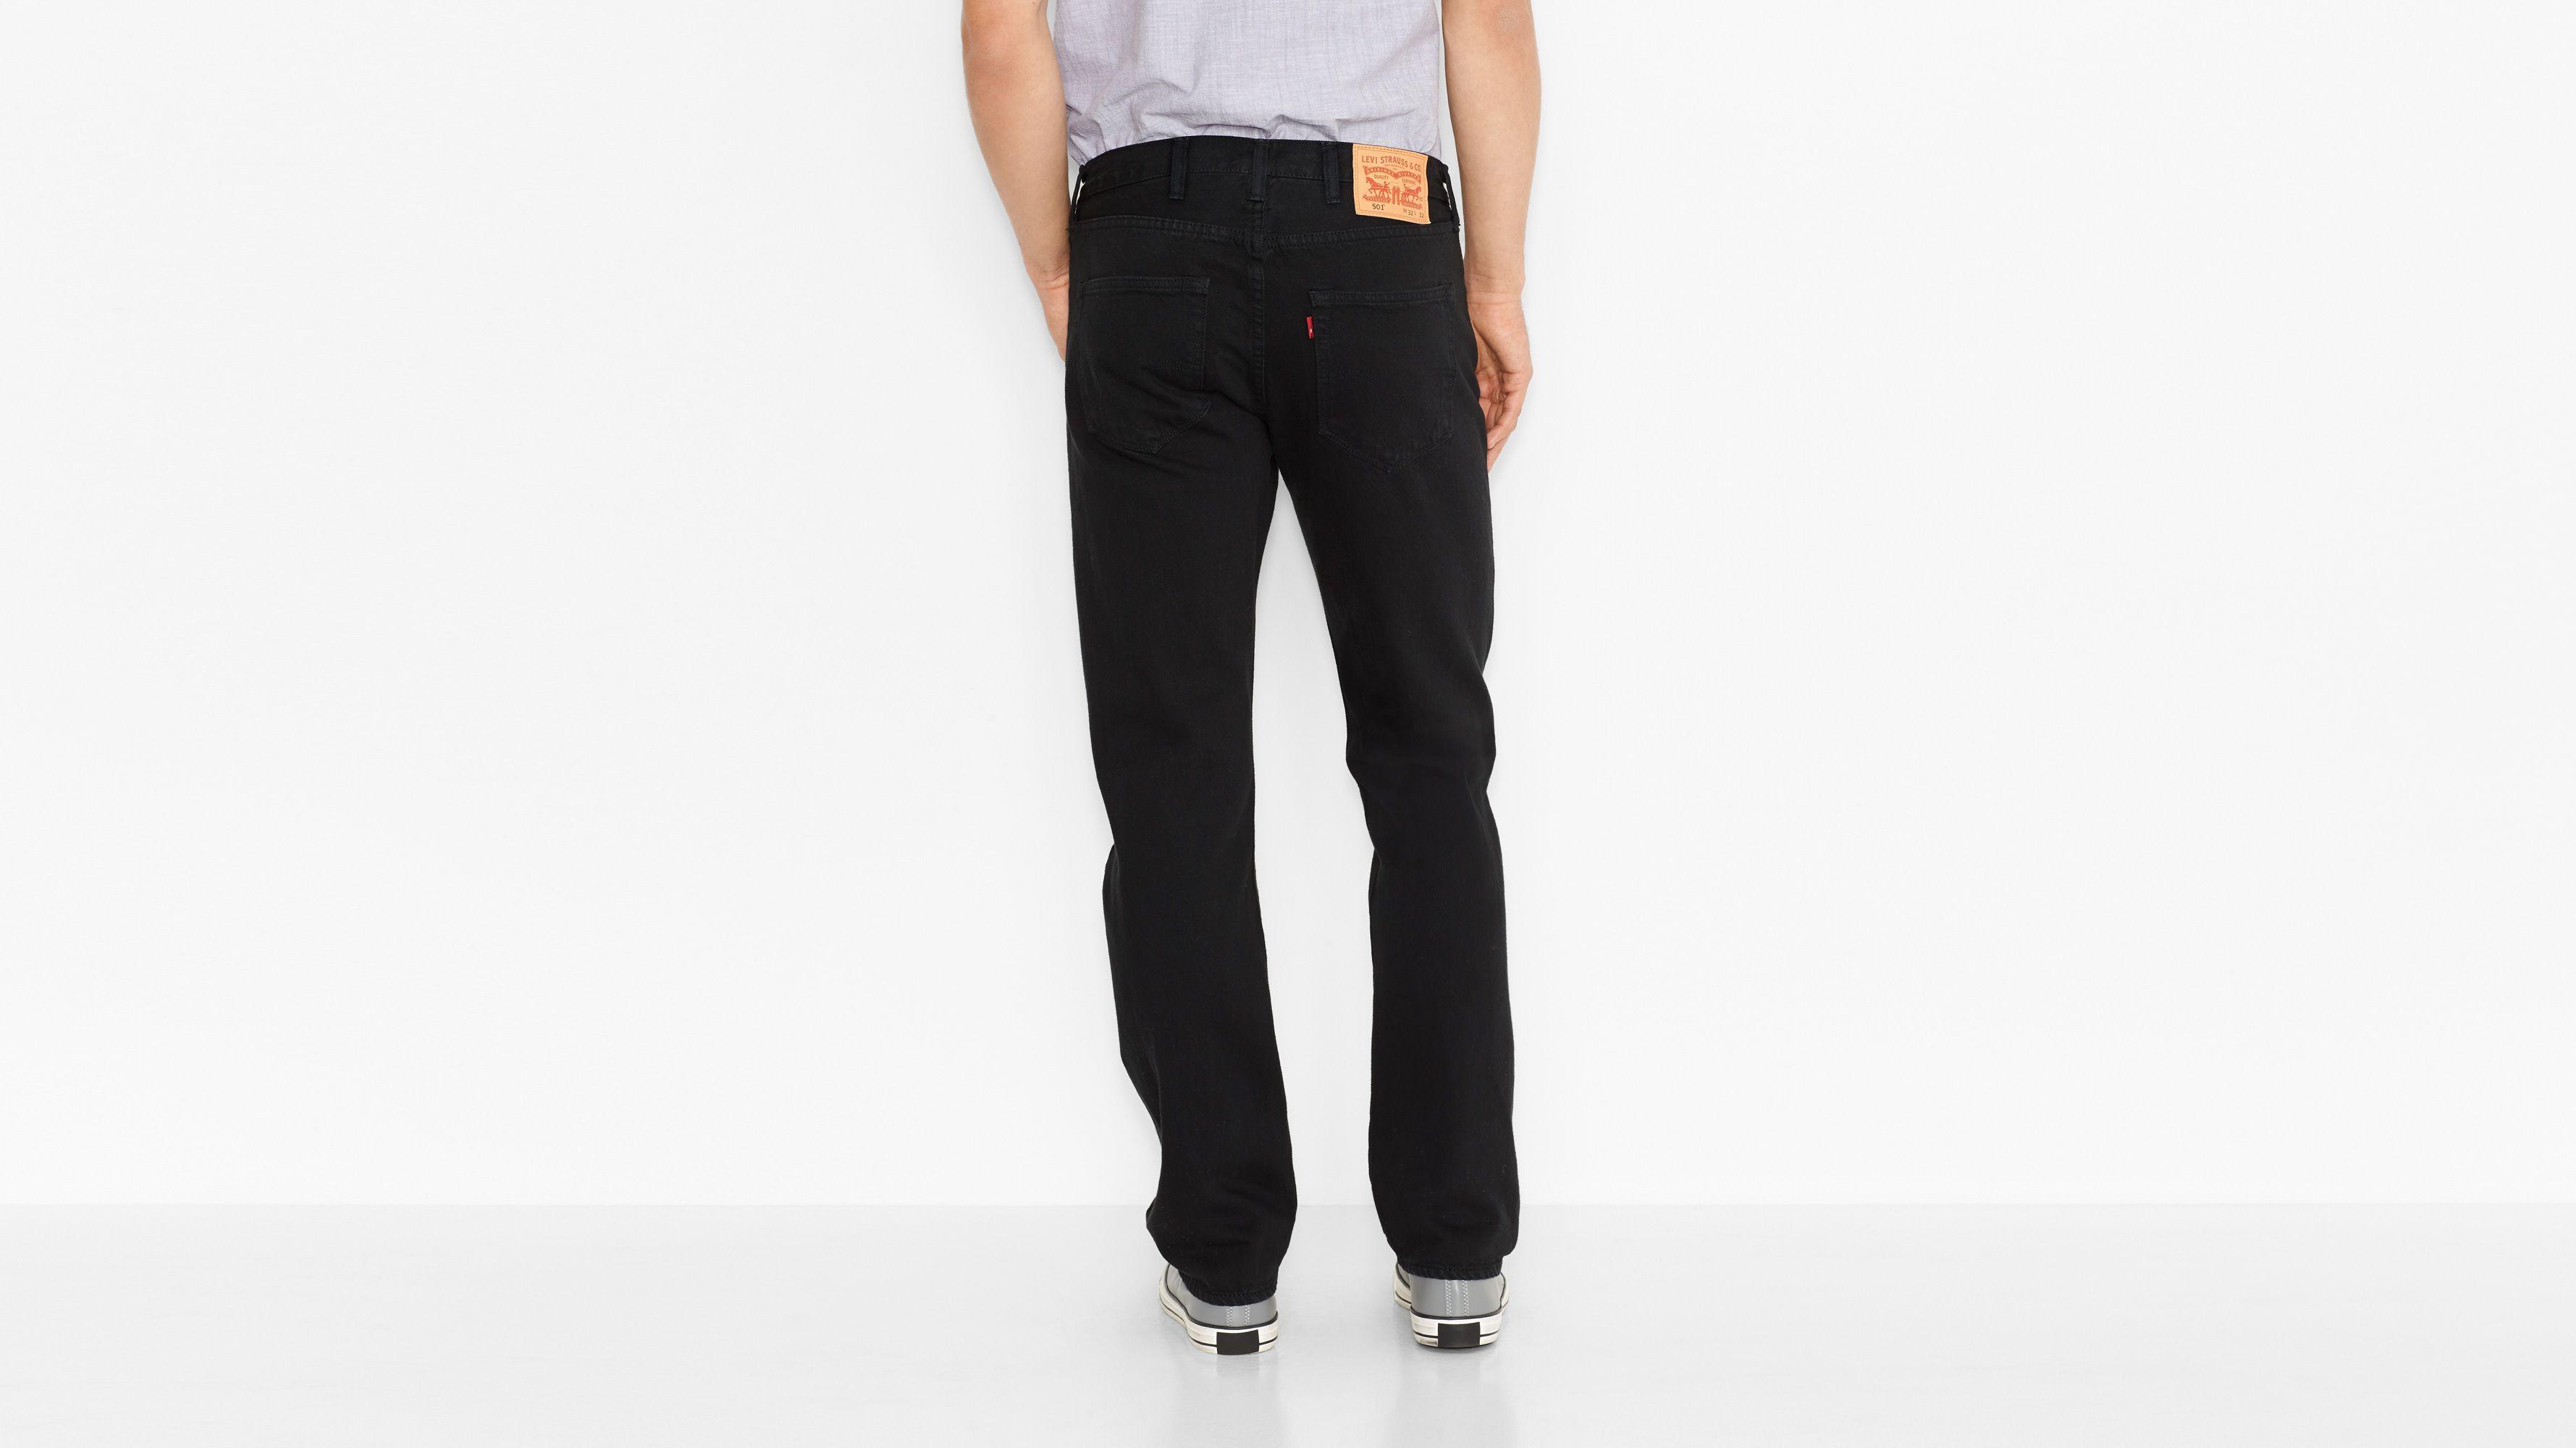 cafb9fa68 501® Original Fit Jeans - Black